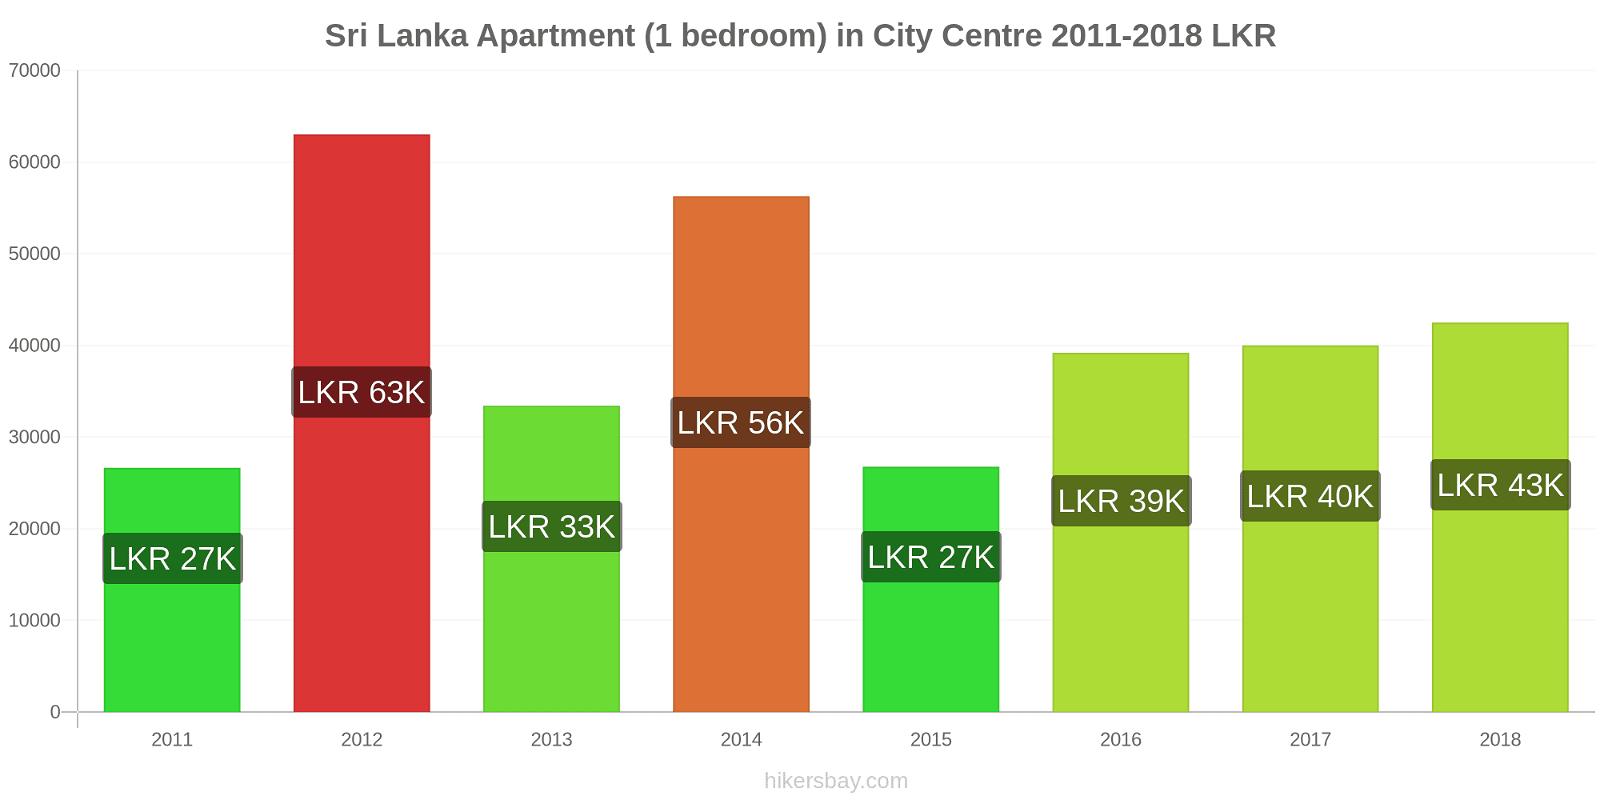 Sri Lanka price changes Apartment (1 bedroom) in City Centre hikersbay.com